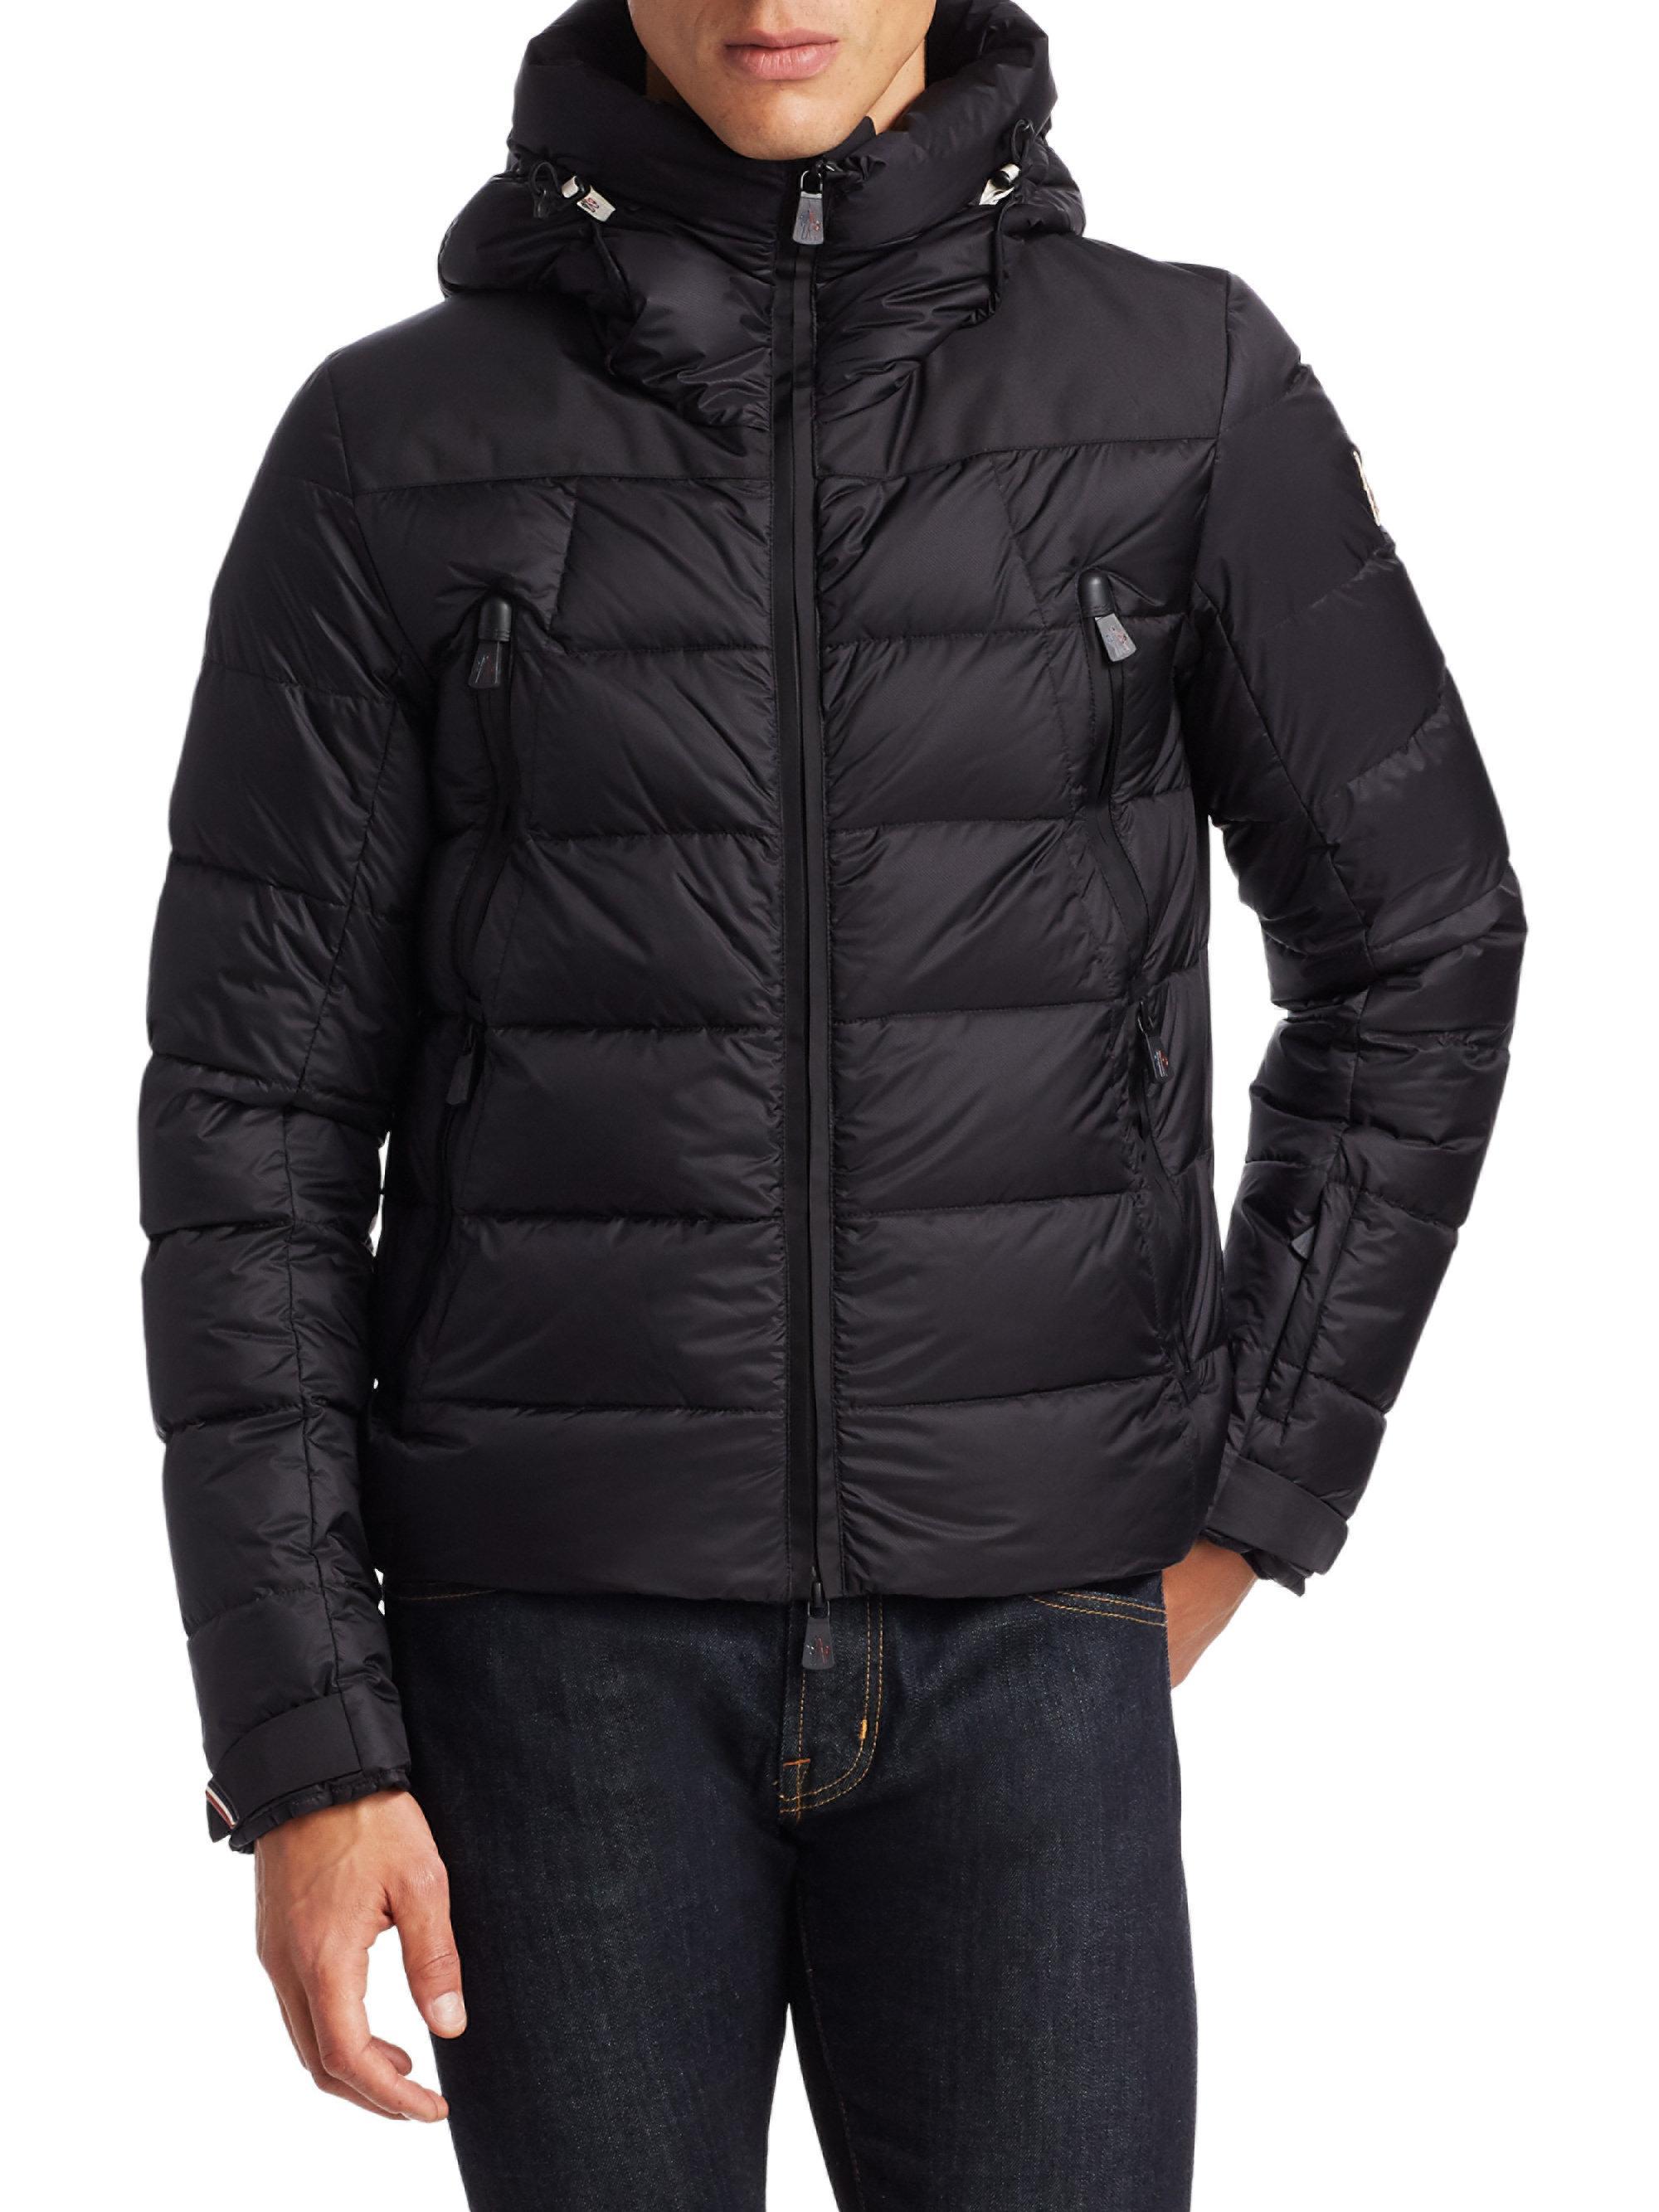 moncler black puffer jacket mens